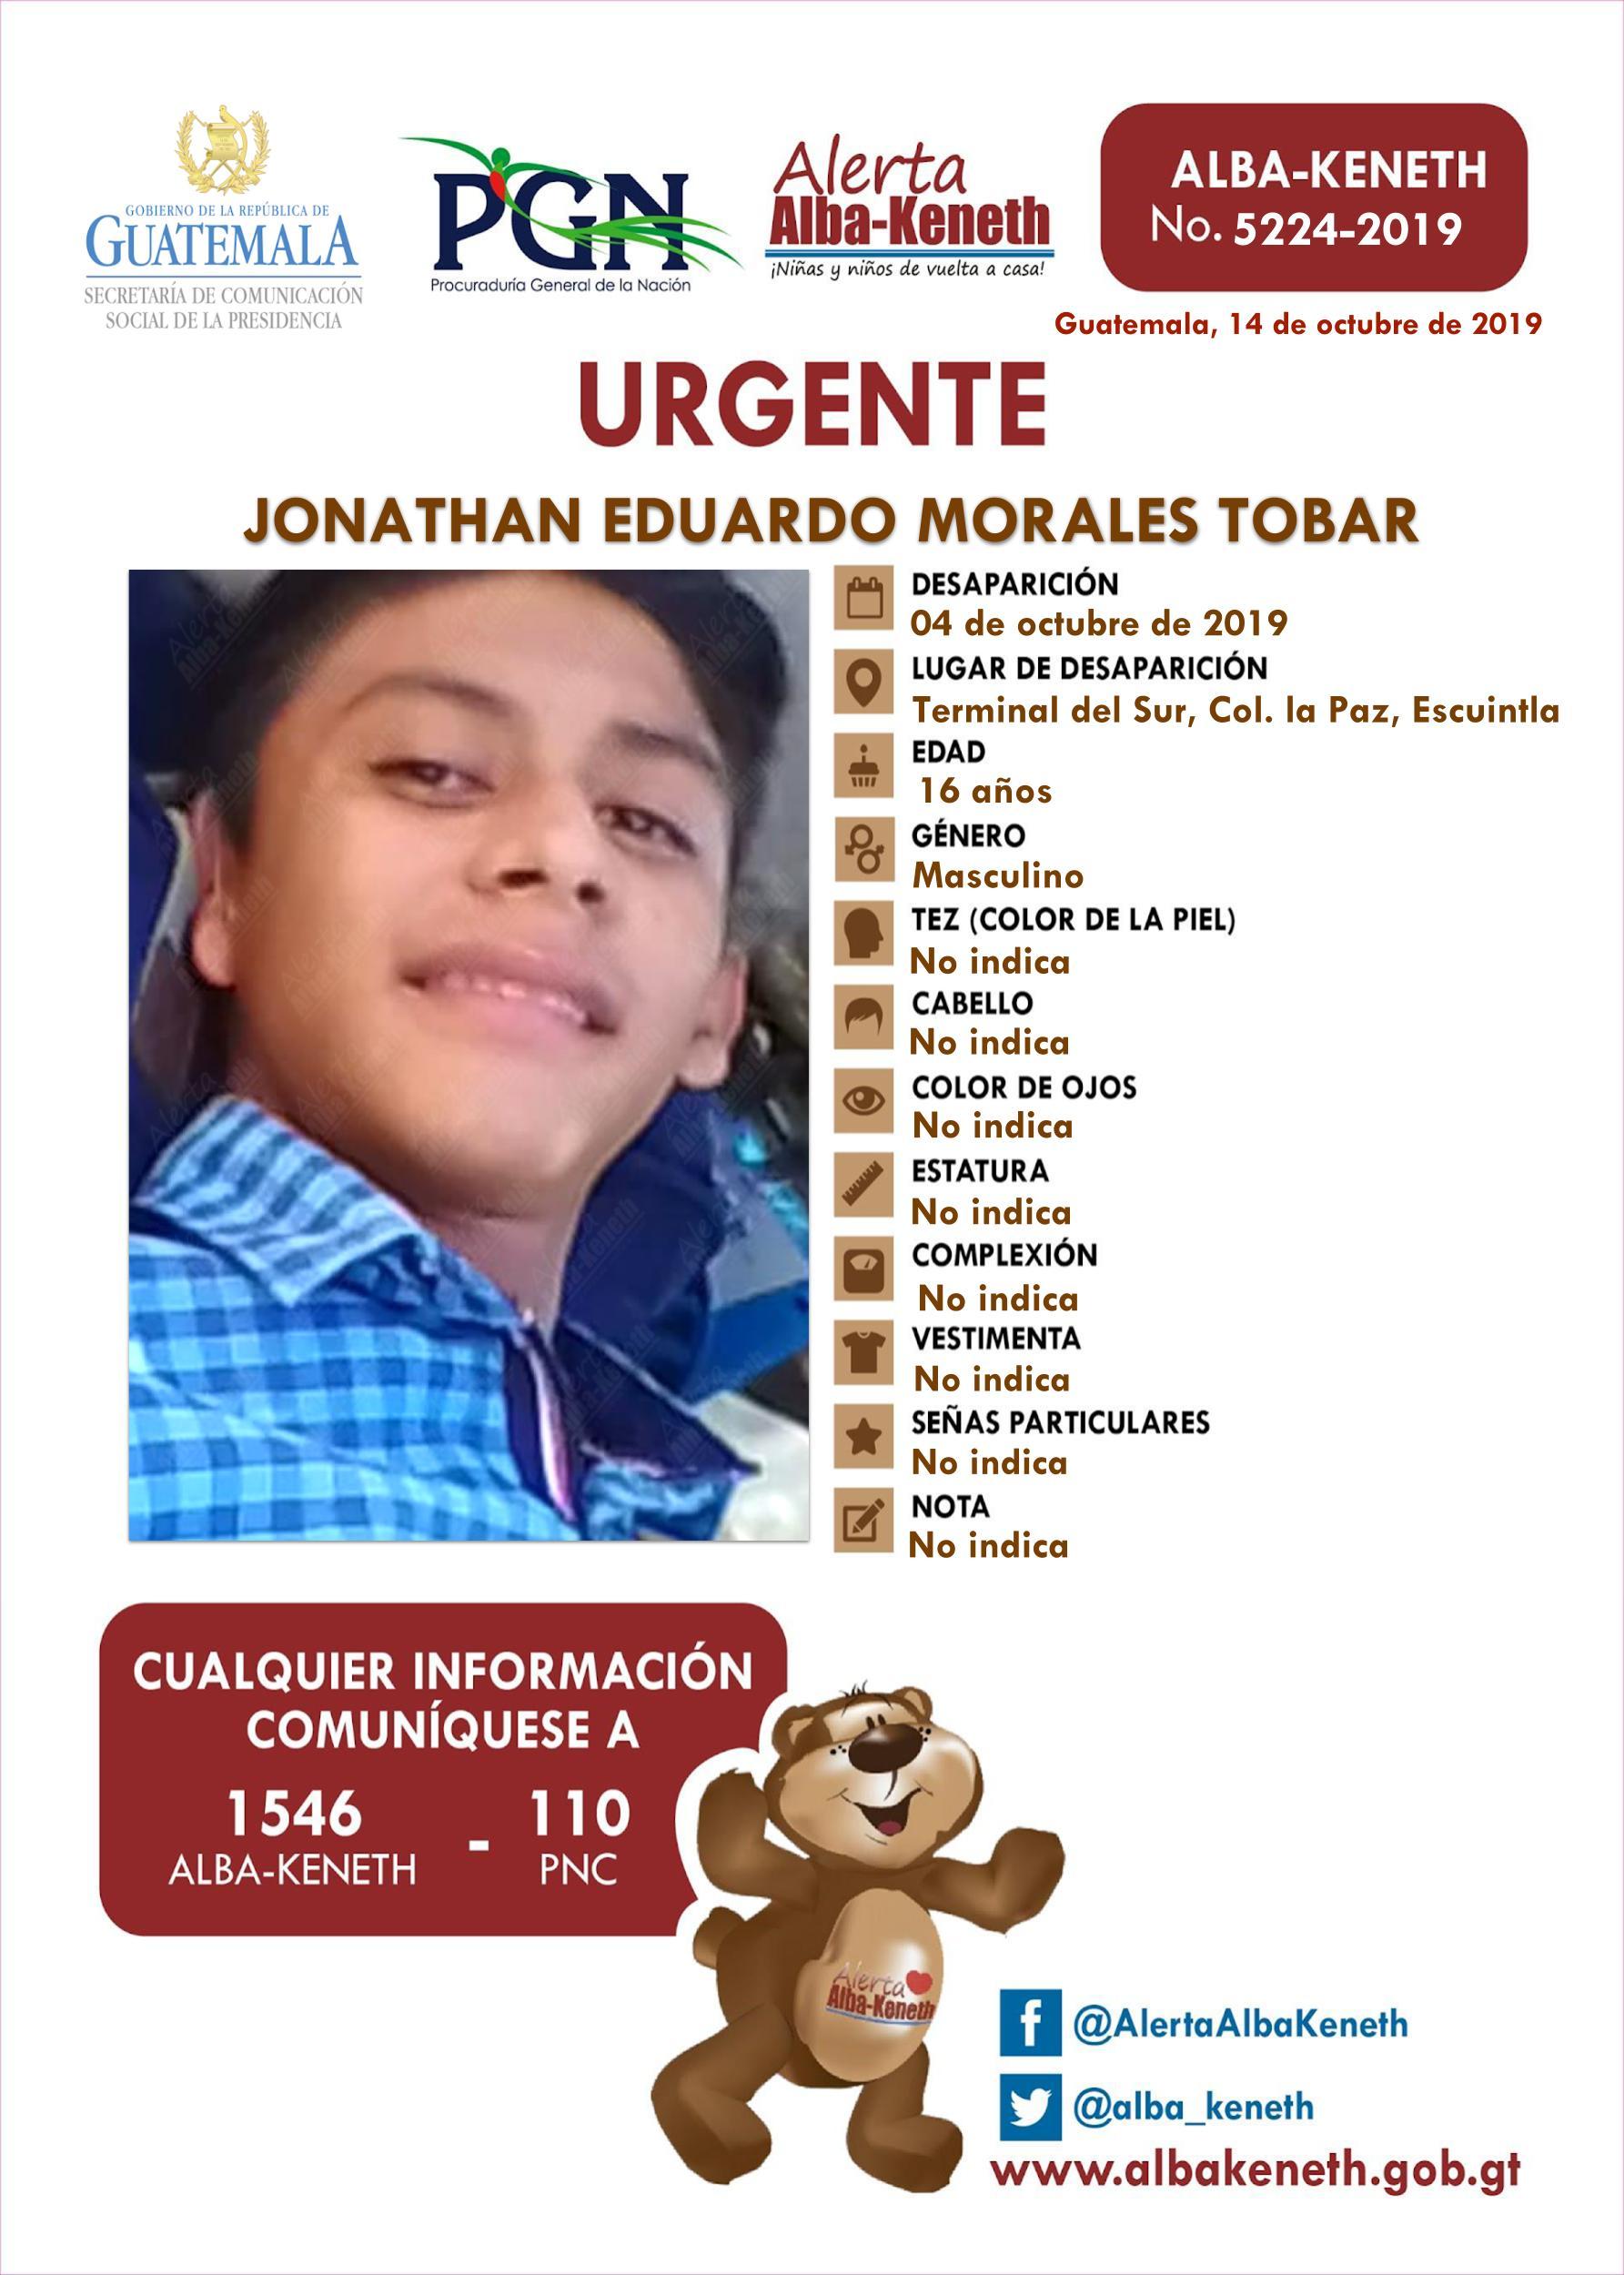 Jonathan Eduardo Morales Tobar